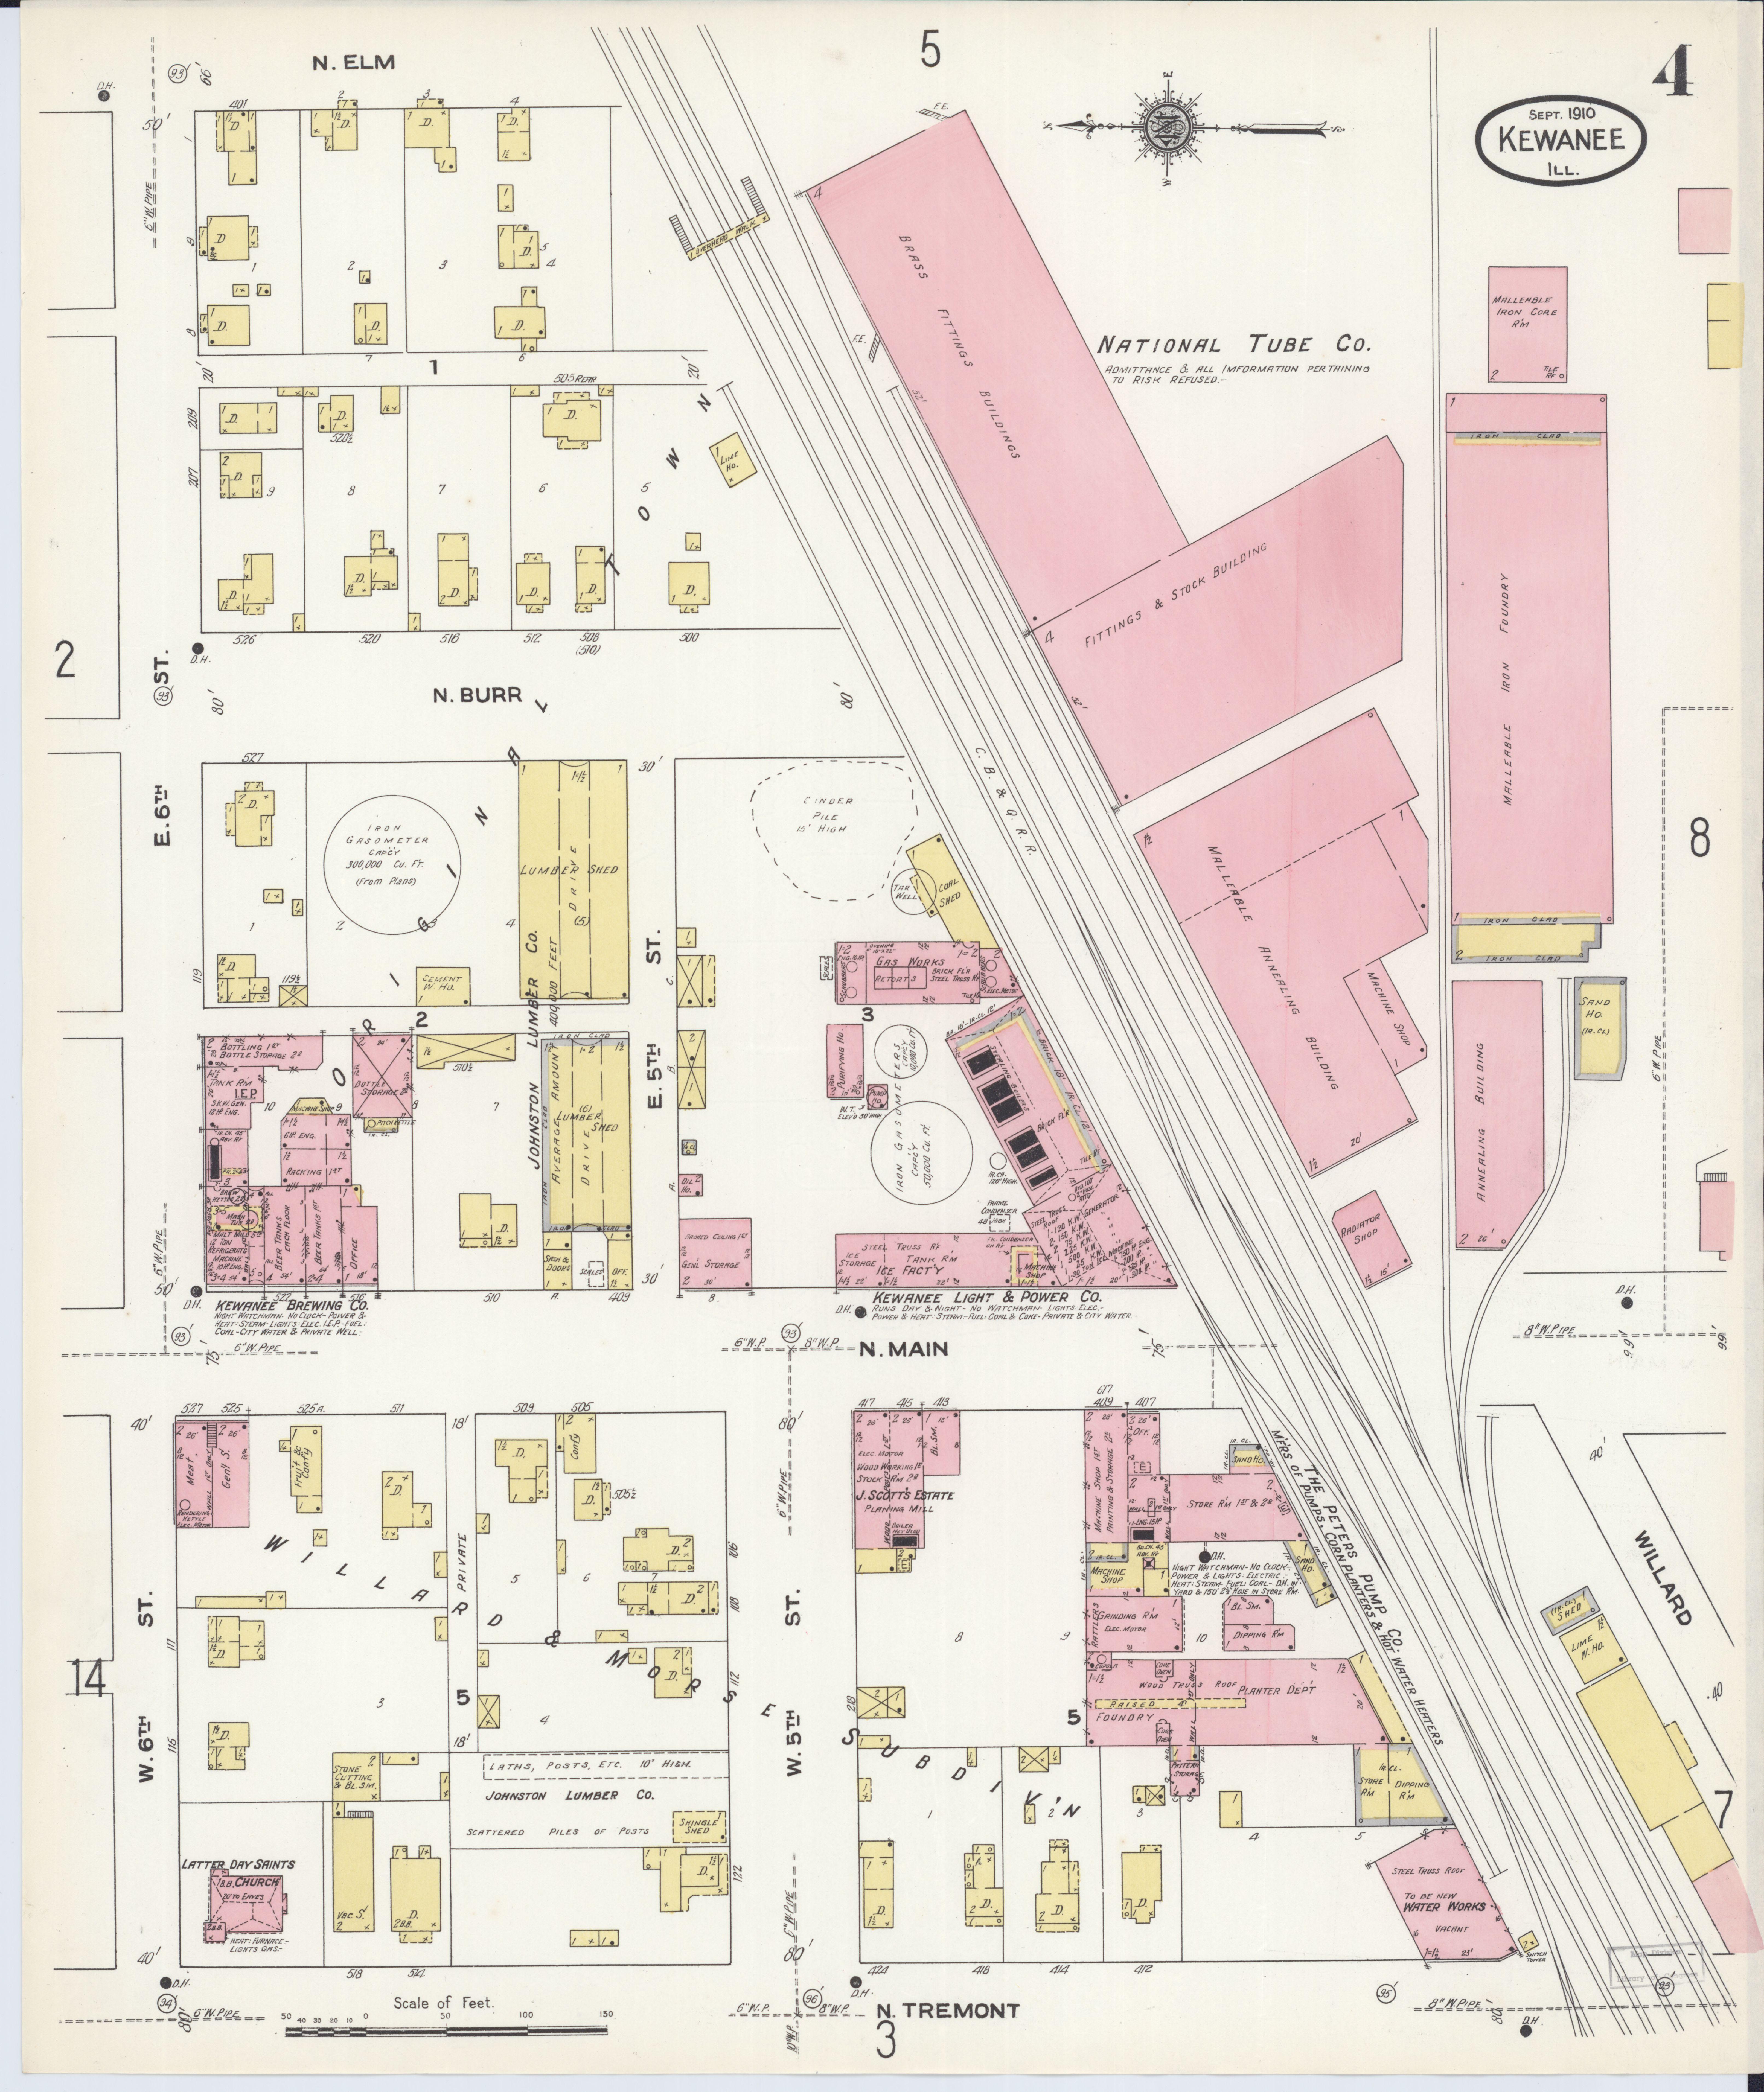 Kewanee Illinois Map.File Sanborn Fire Insurance Map From Kewanee Henry County Illinois